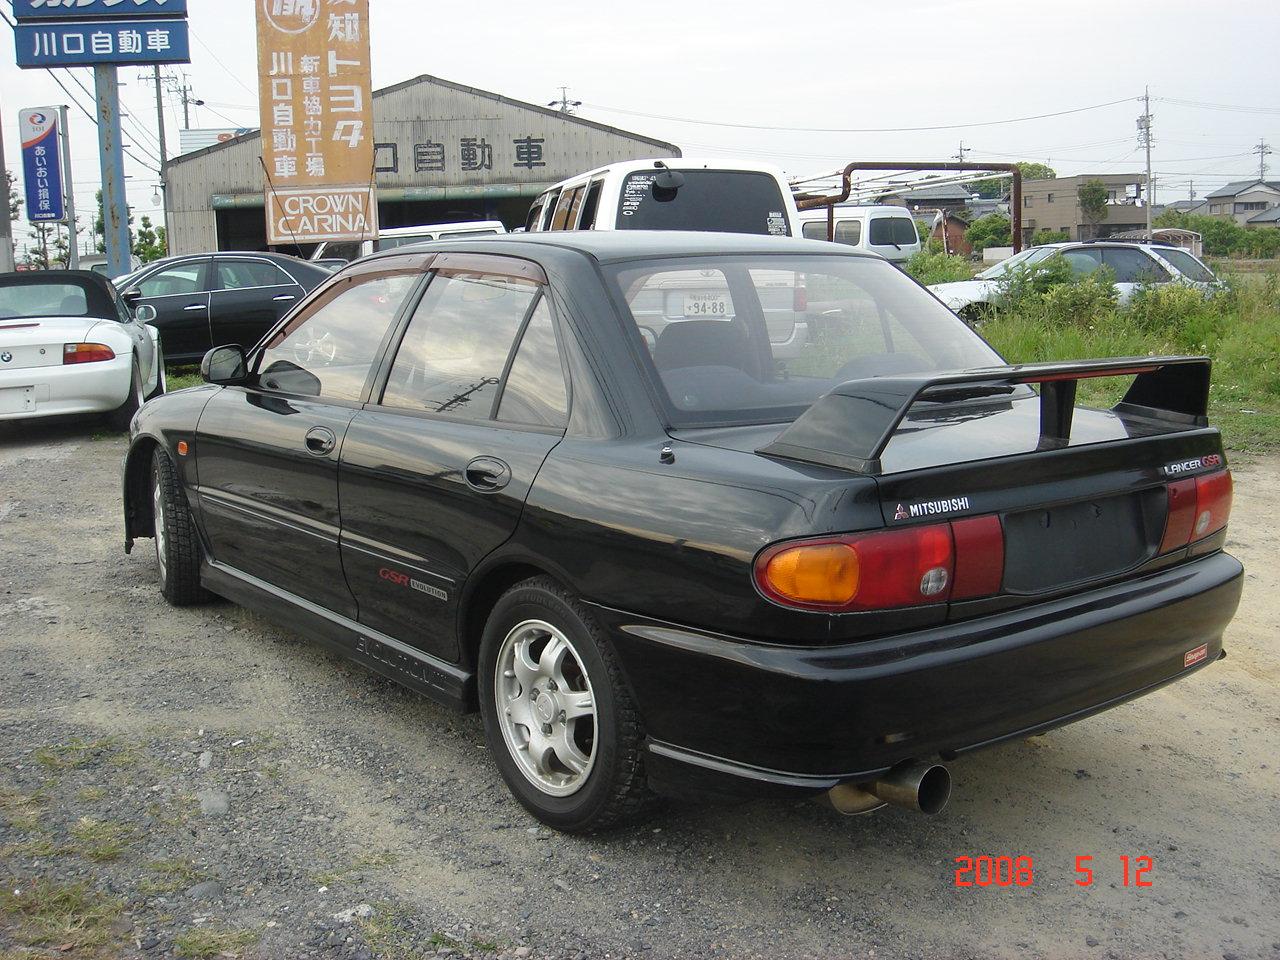 used mitsubishi lancer evolution cars for sale in auto. Black Bedroom Furniture Sets. Home Design Ideas